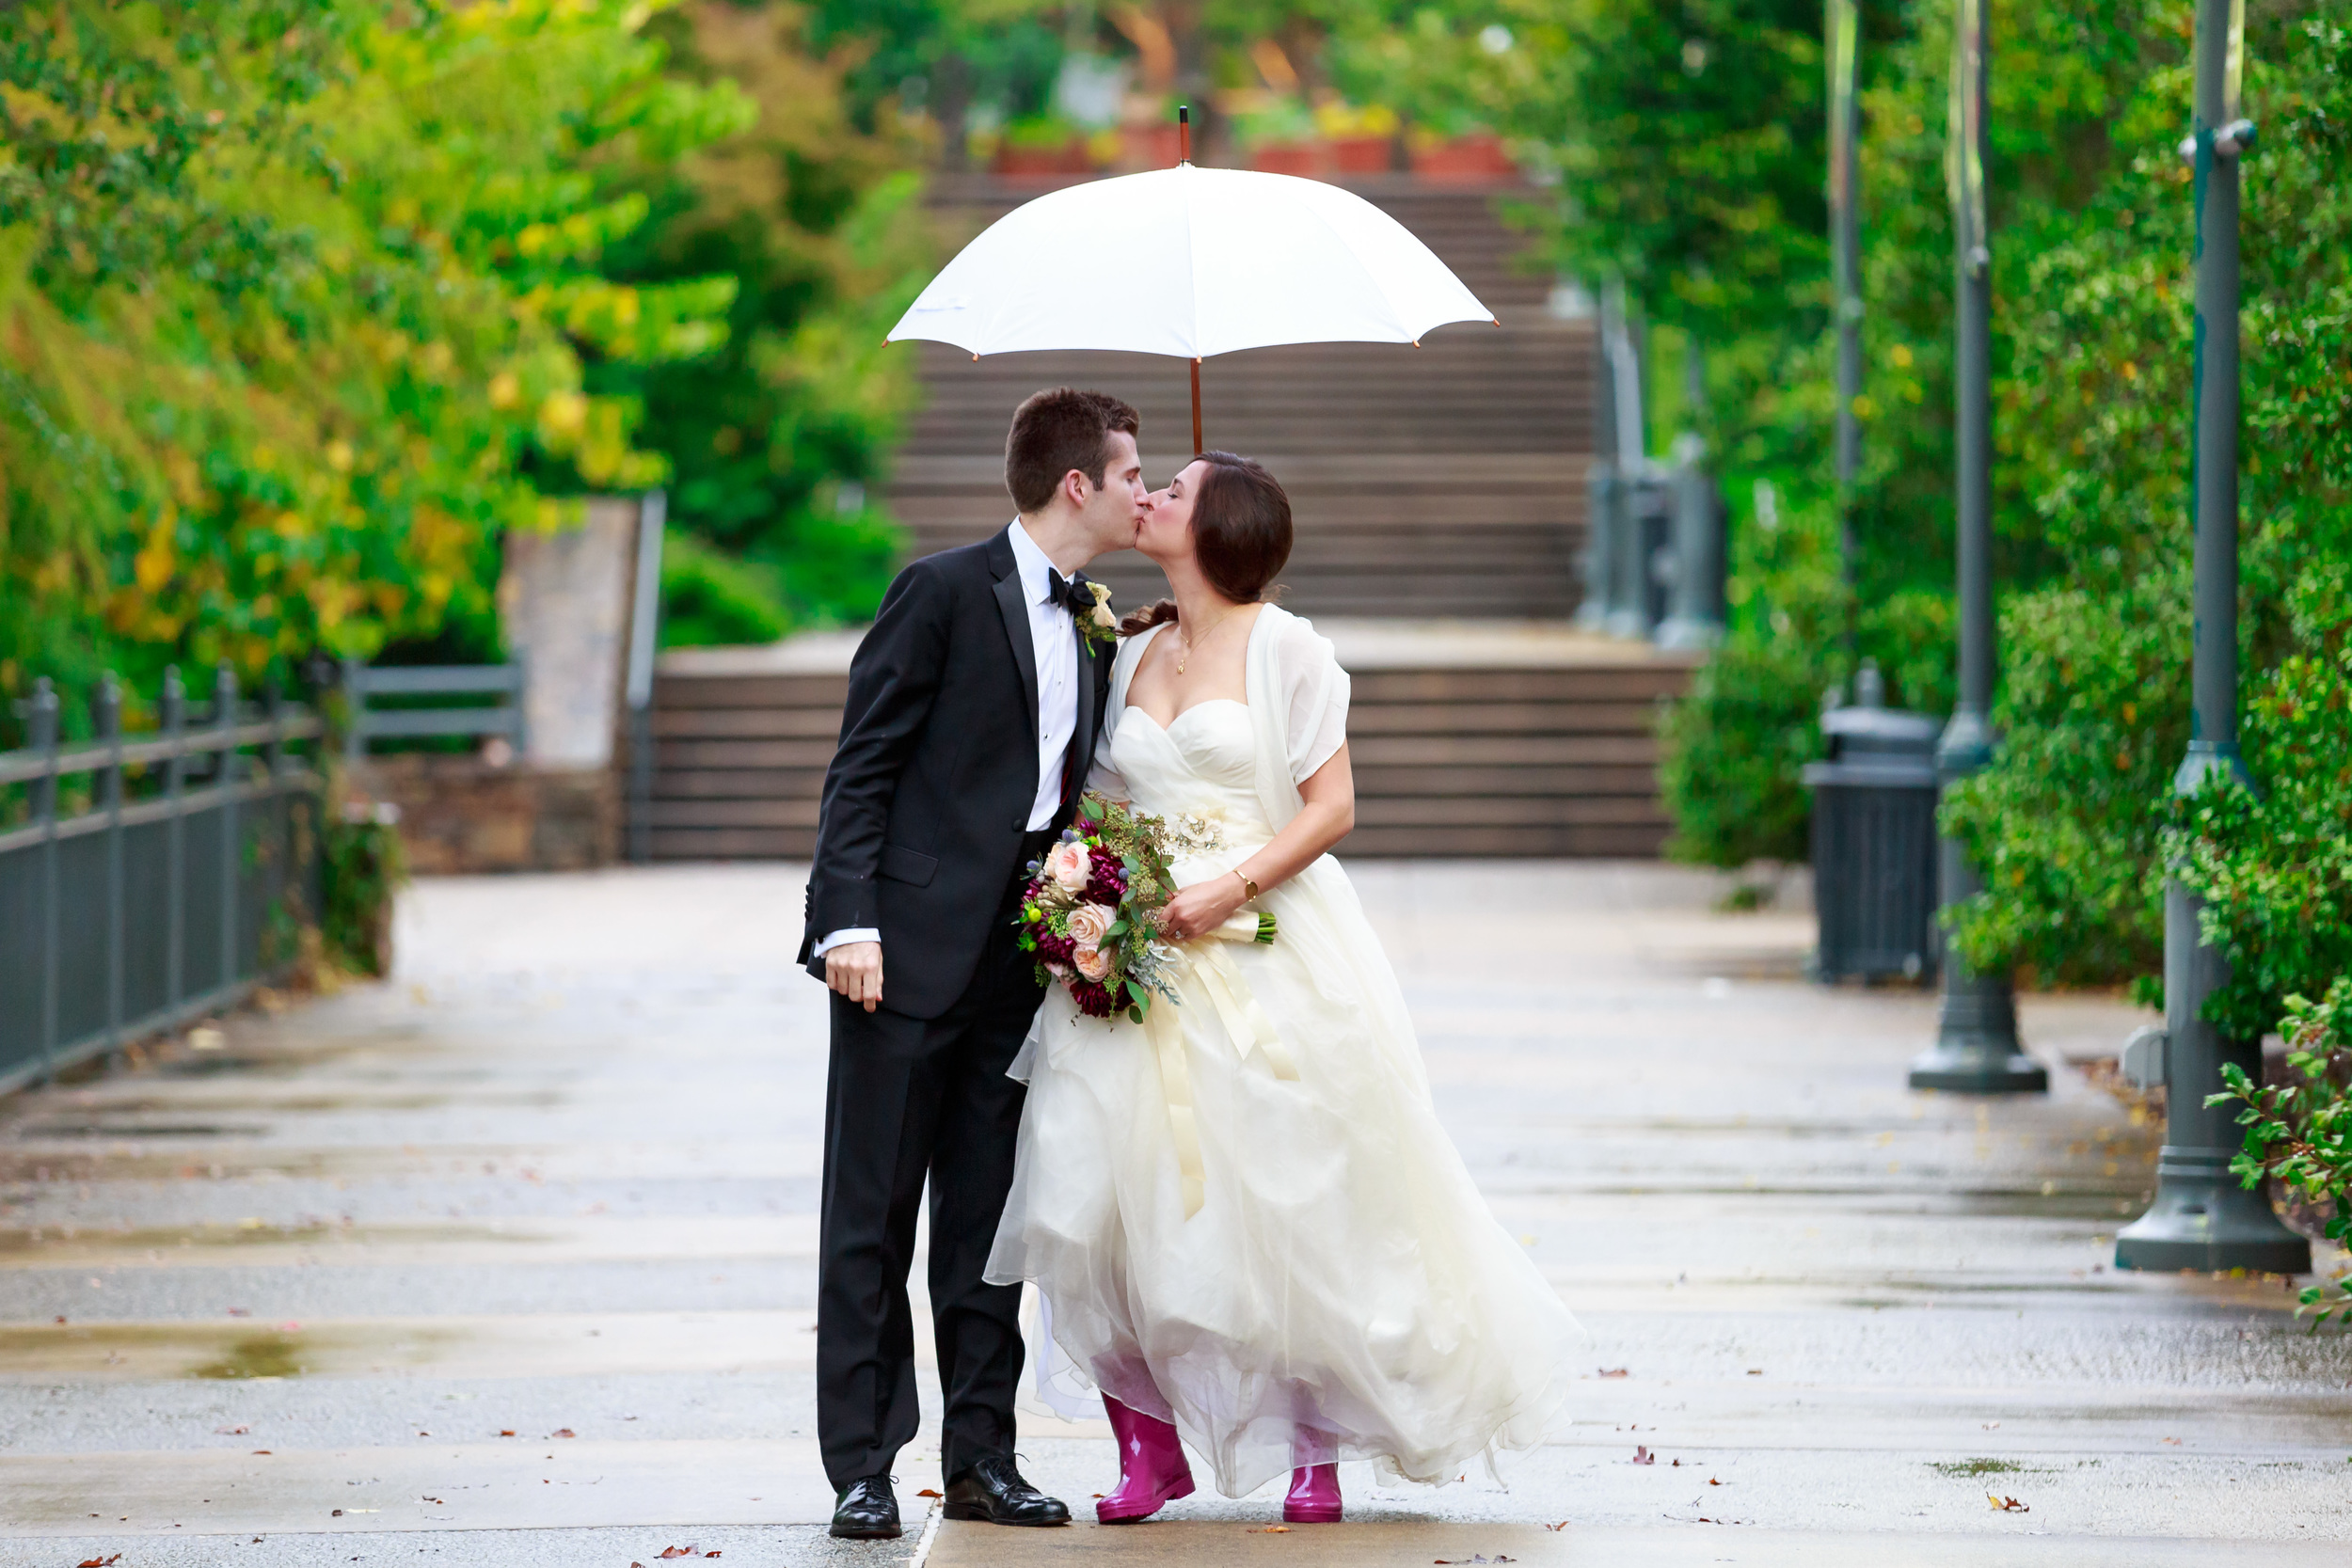 Christine Piascik & Alex McKenzie Wedding at North Carolina Arboretum-256.jpg